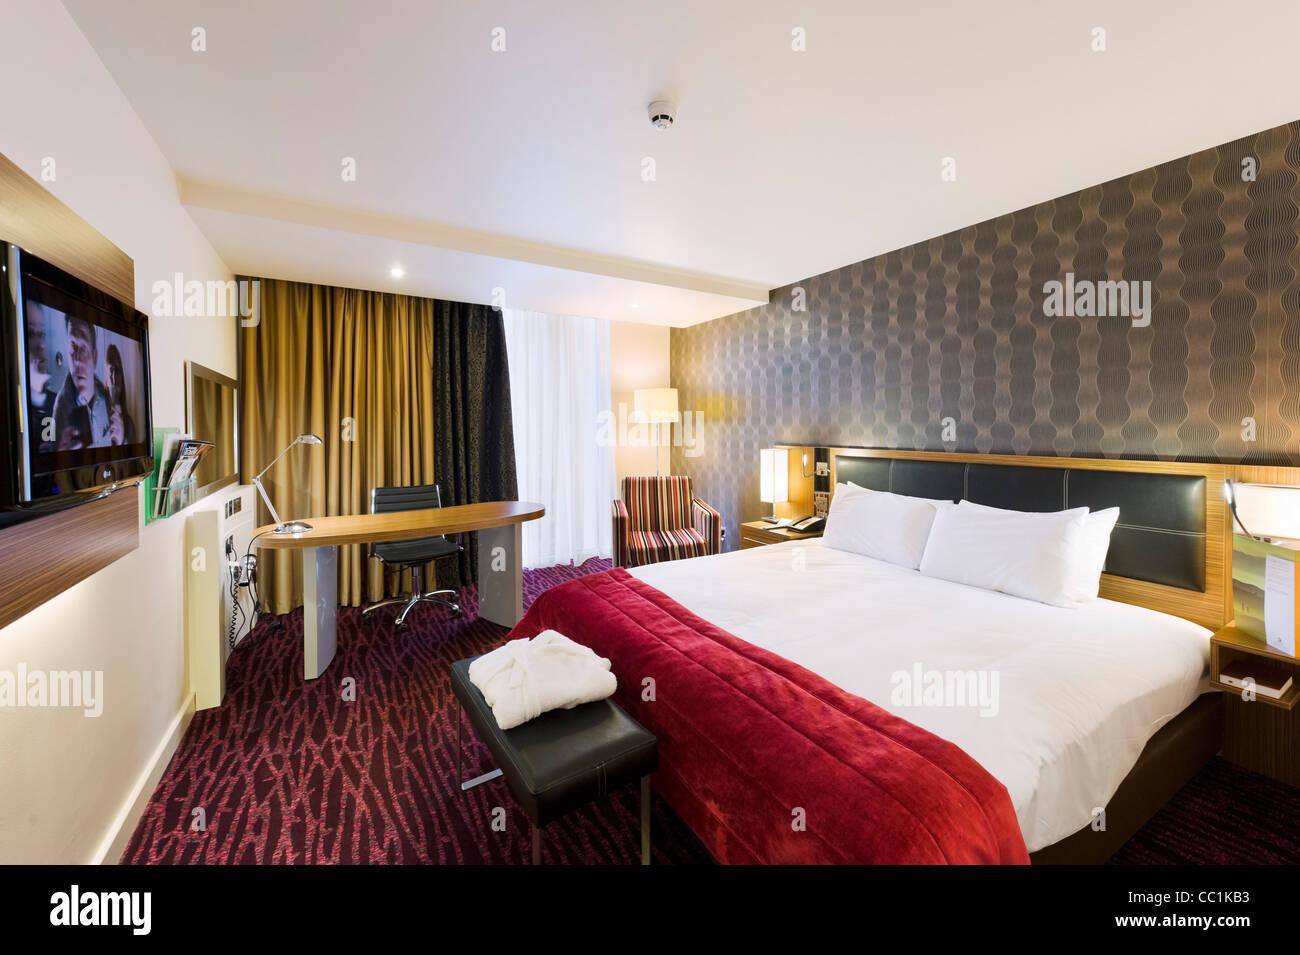 Executive-Zimmer im Holiday Inn, Medienstadt, Salford Quays, Manchester, UK Stockbild